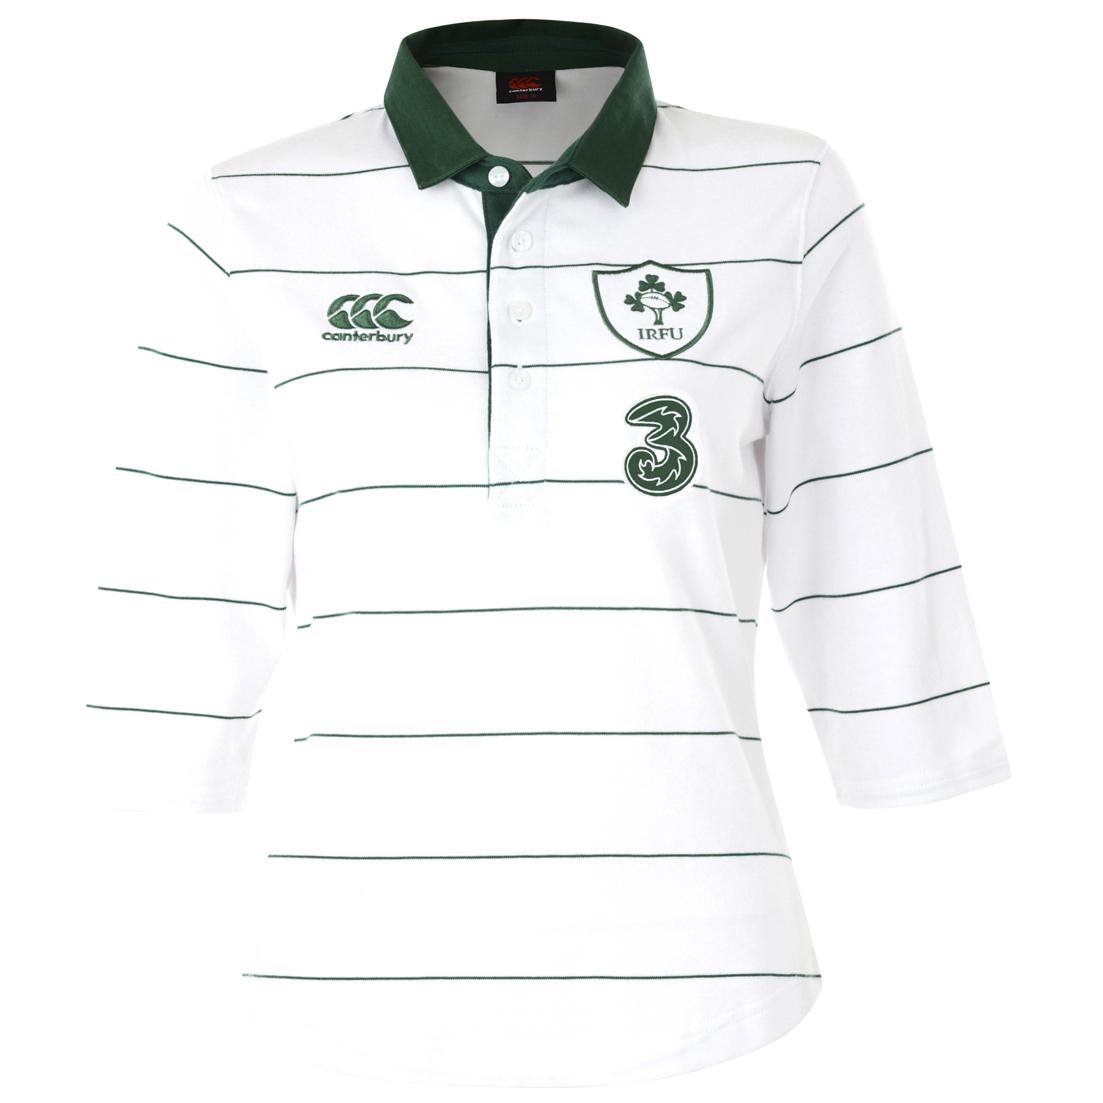 Ireland Alternate Classic 3/4 Sleeve Rugby Shirt 2014/15 - Womens White